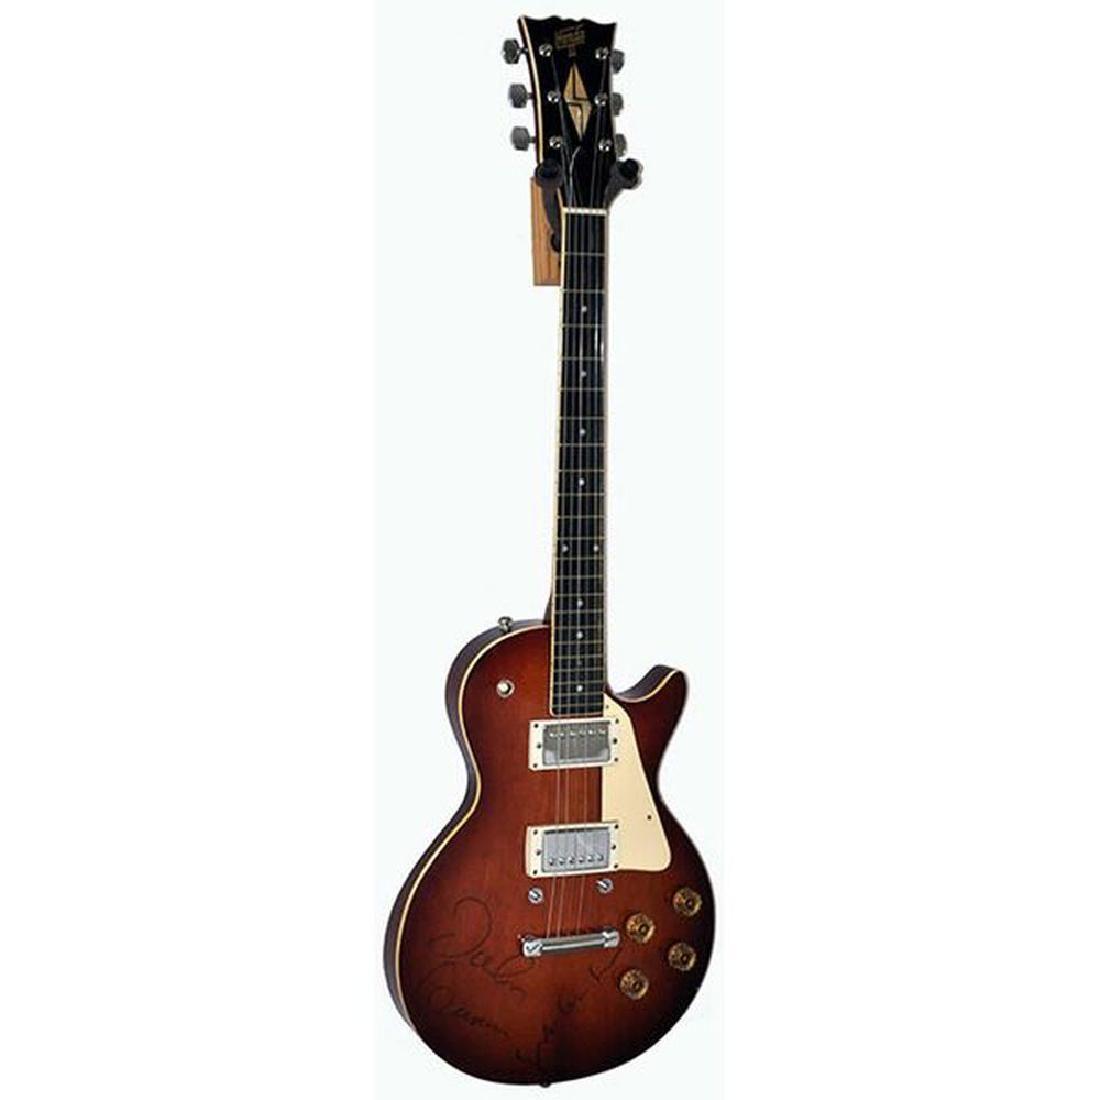 John Lennon + Yoko Ono Signed Guitar